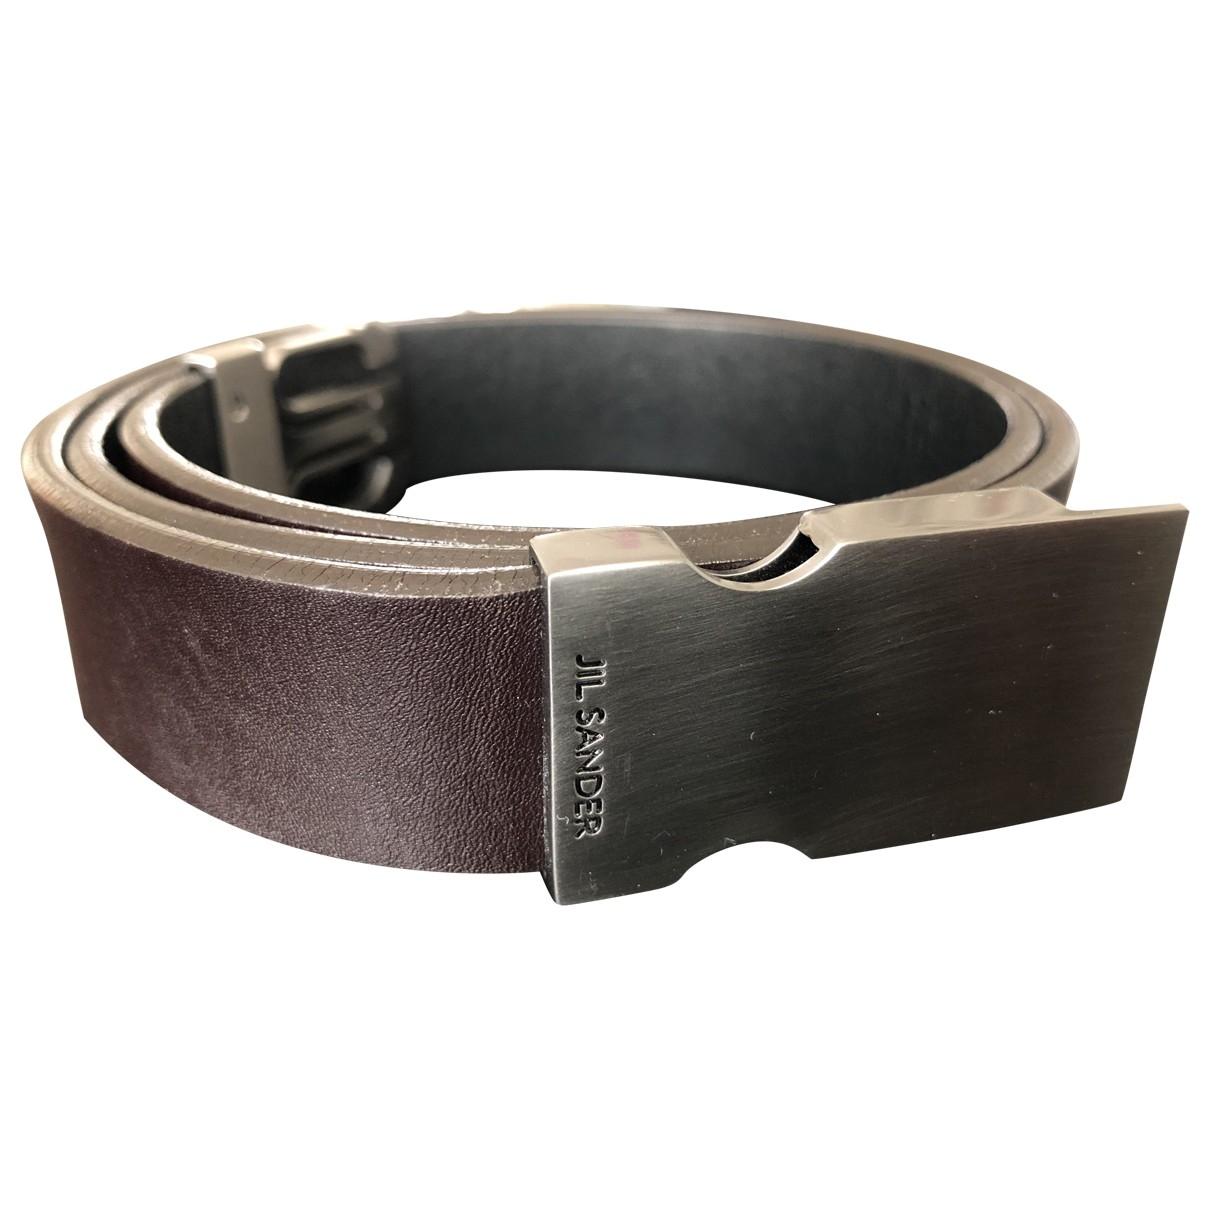 Jil Sander \N Brown Leather belt for Women 75 cm